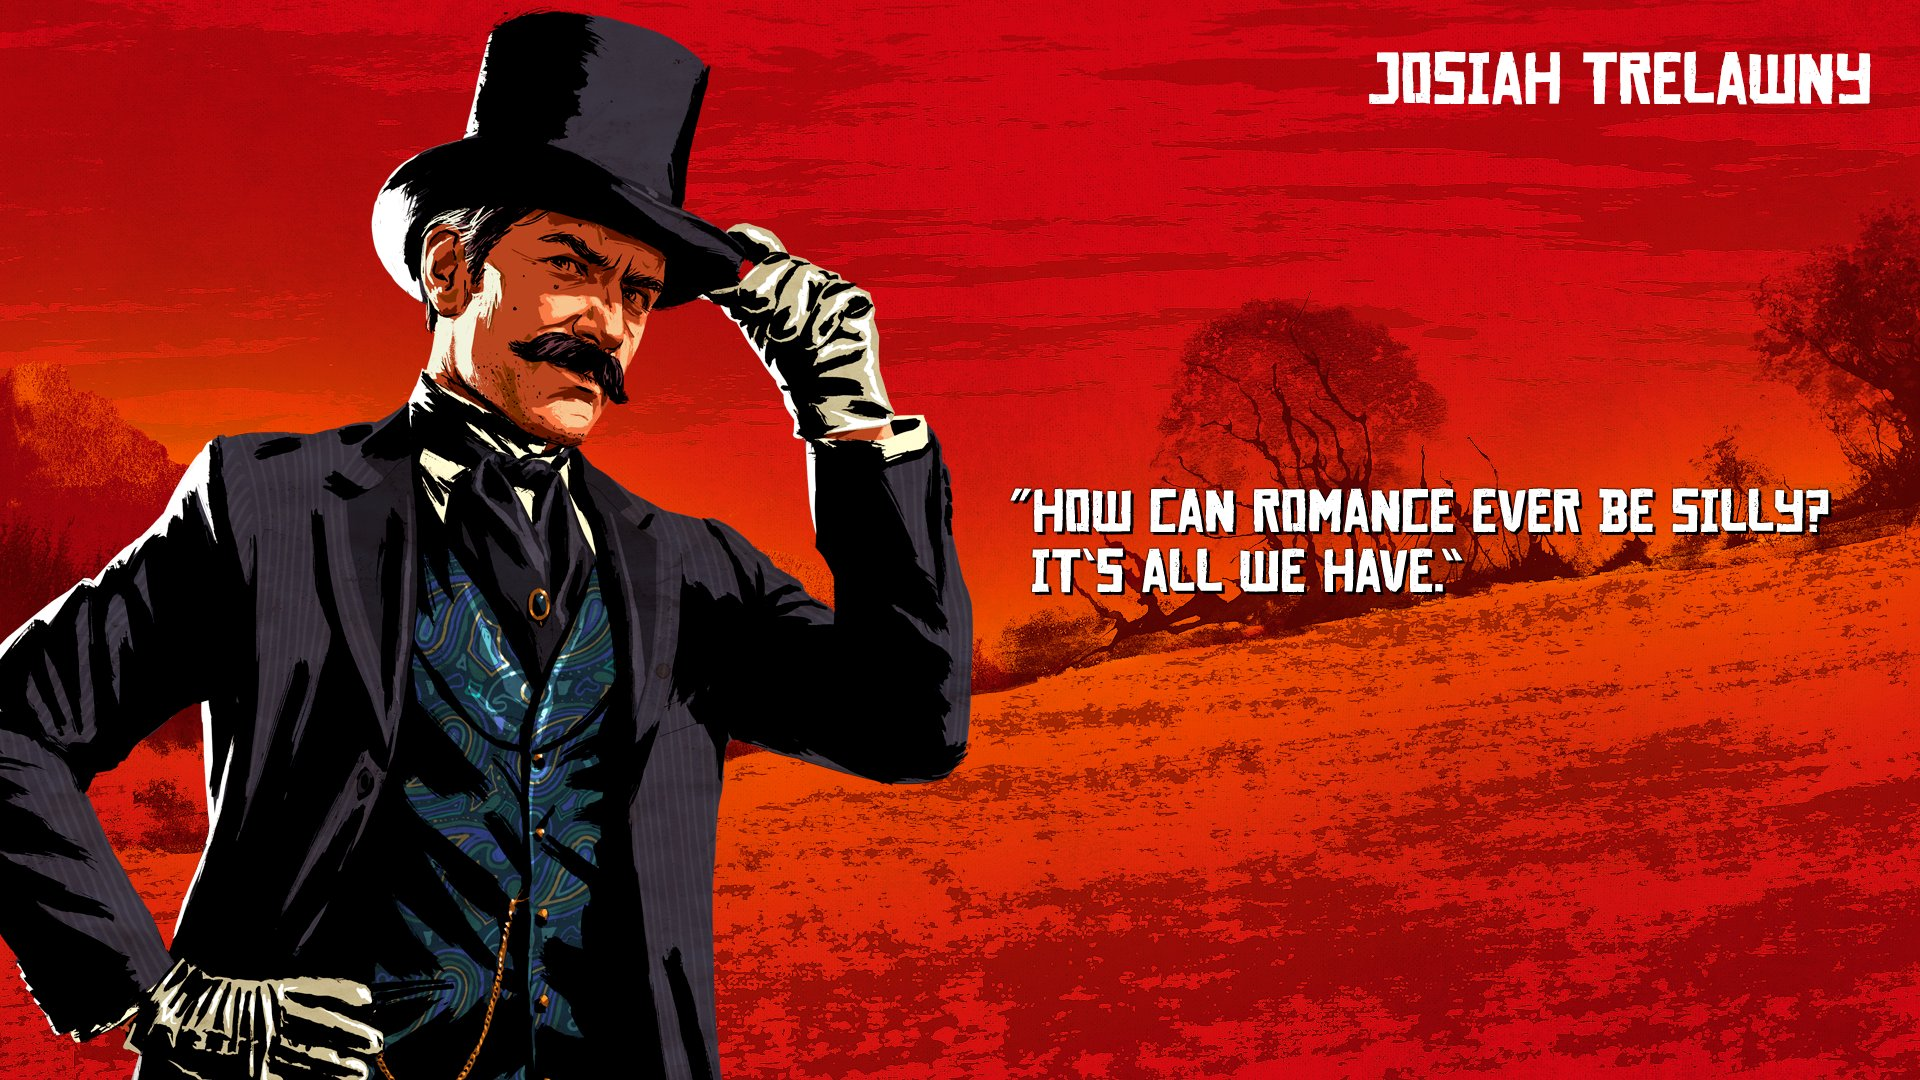 Red Dead Redemption 2 Josiah Wallpaper 68175 1920x1080px